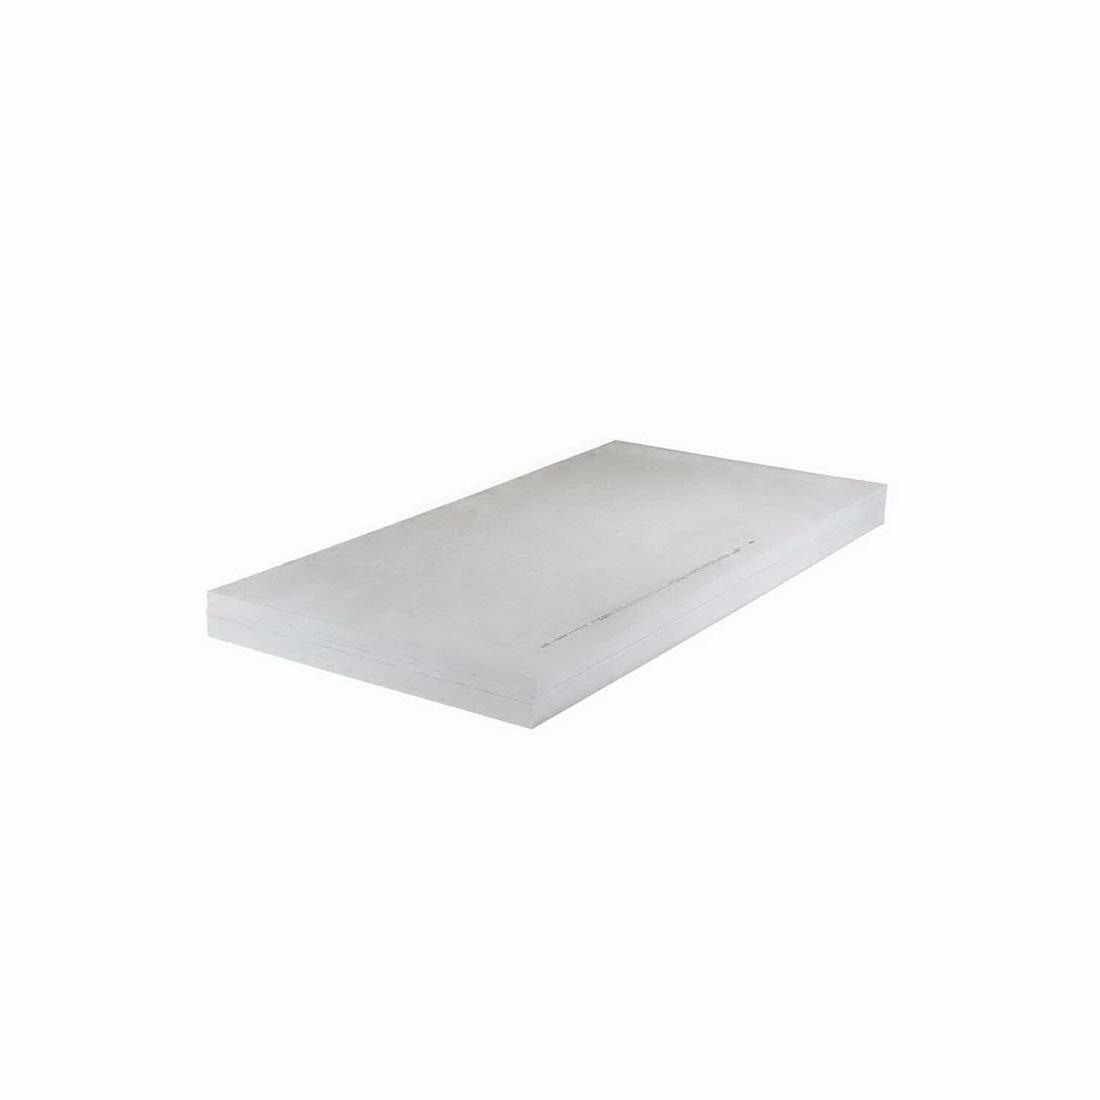 HardiePanel Compressed Sheet 18mm 1800 x 1200mm